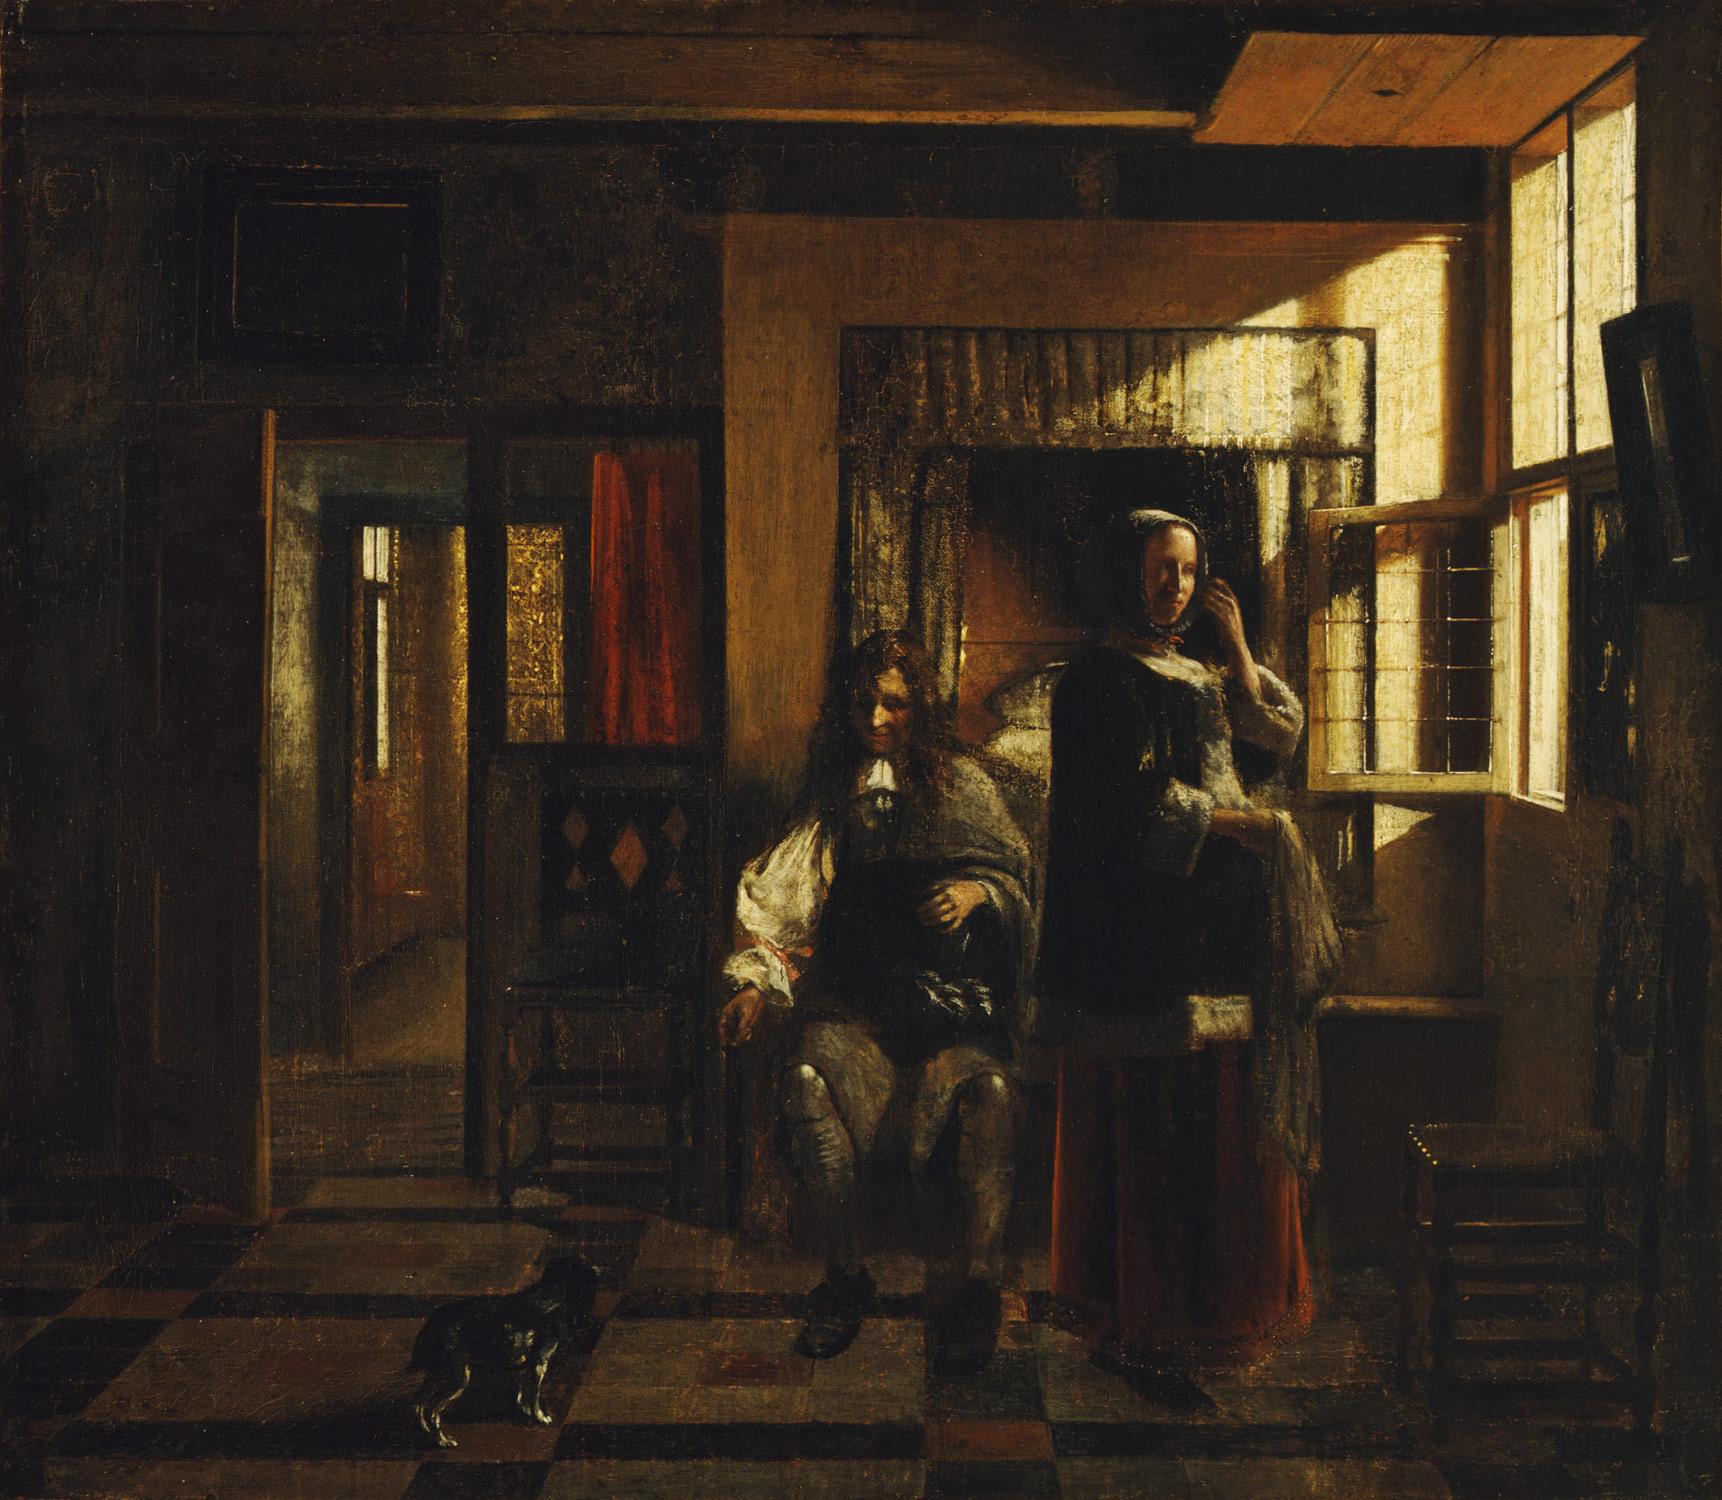 Pieter de Hooch, Intérieur avec un jeune couple, Metropolitan Museum, New York